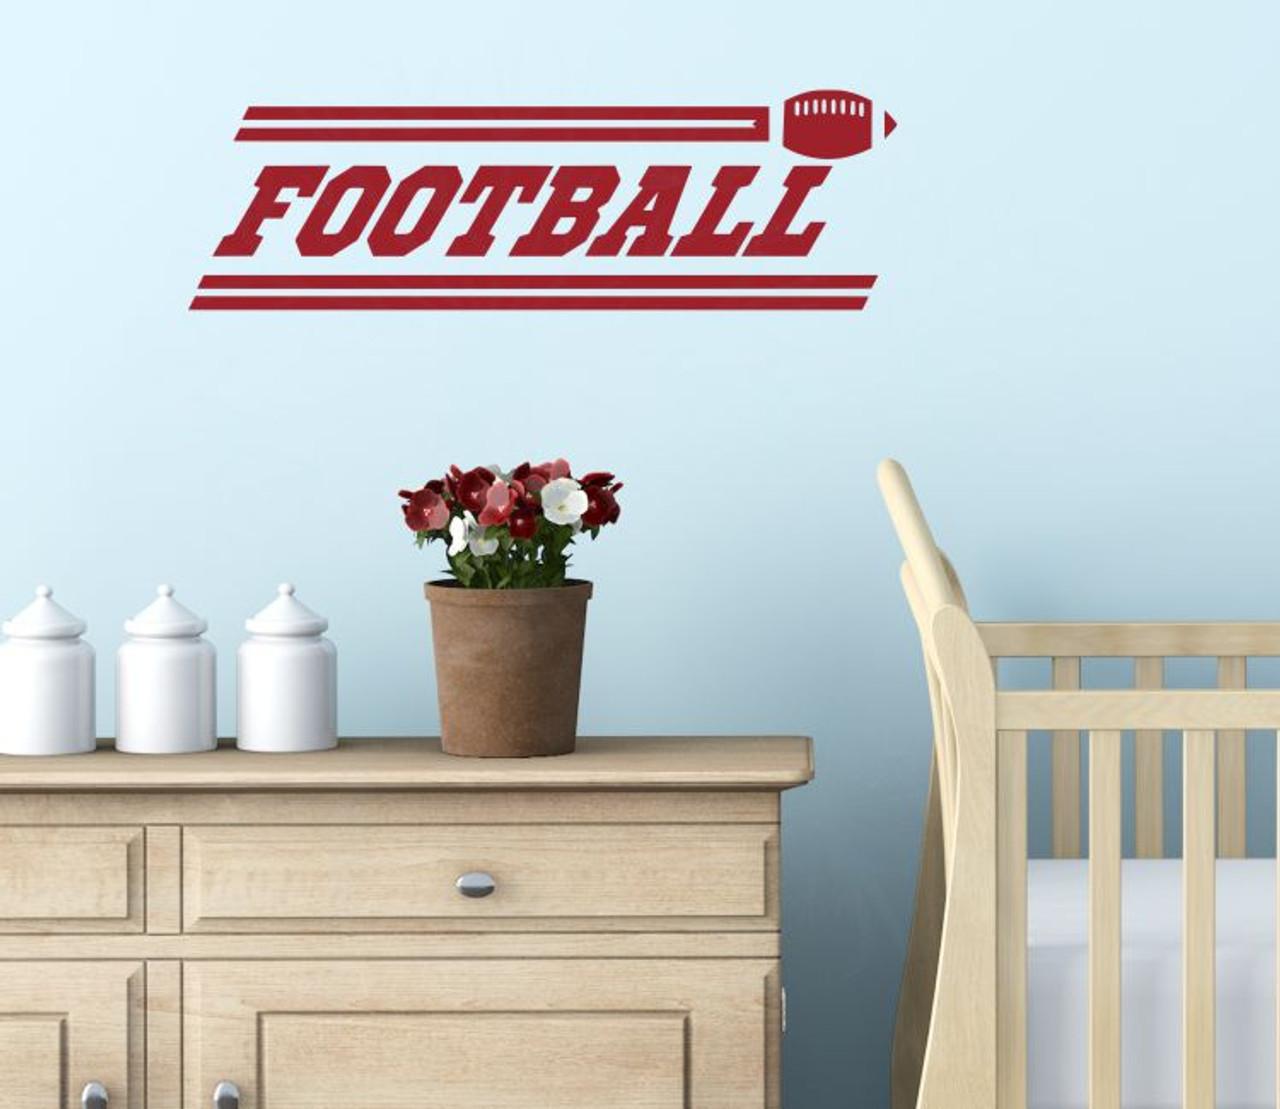 Football Boys Wall Stickers Vinyl Lettering Art Sports Decals